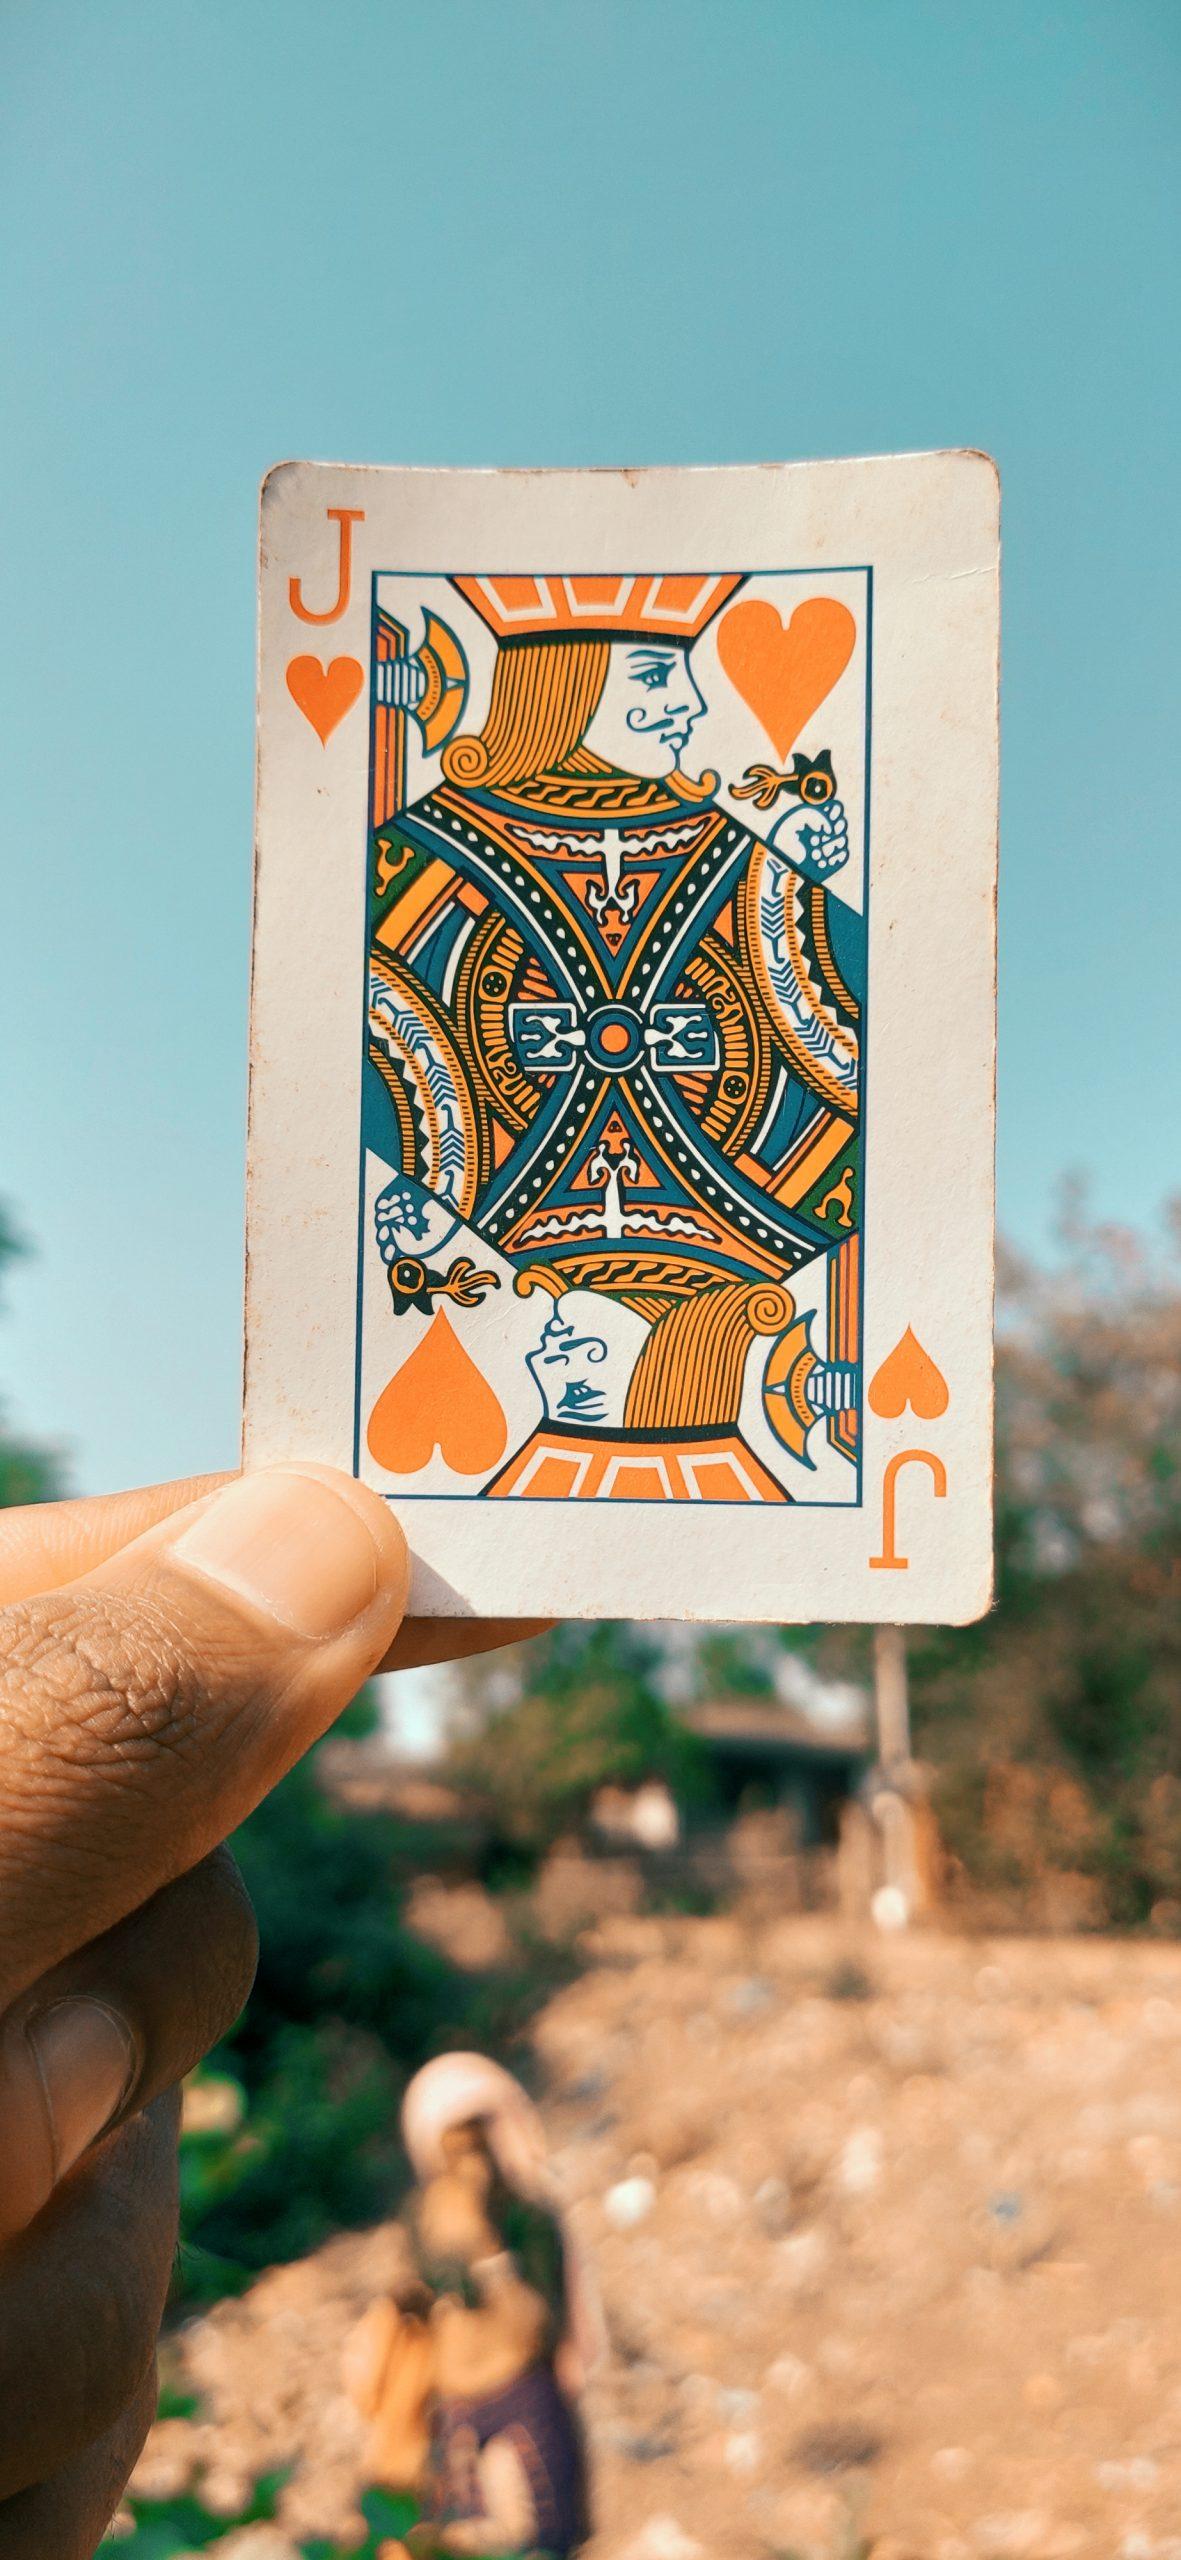 Joker card in hand